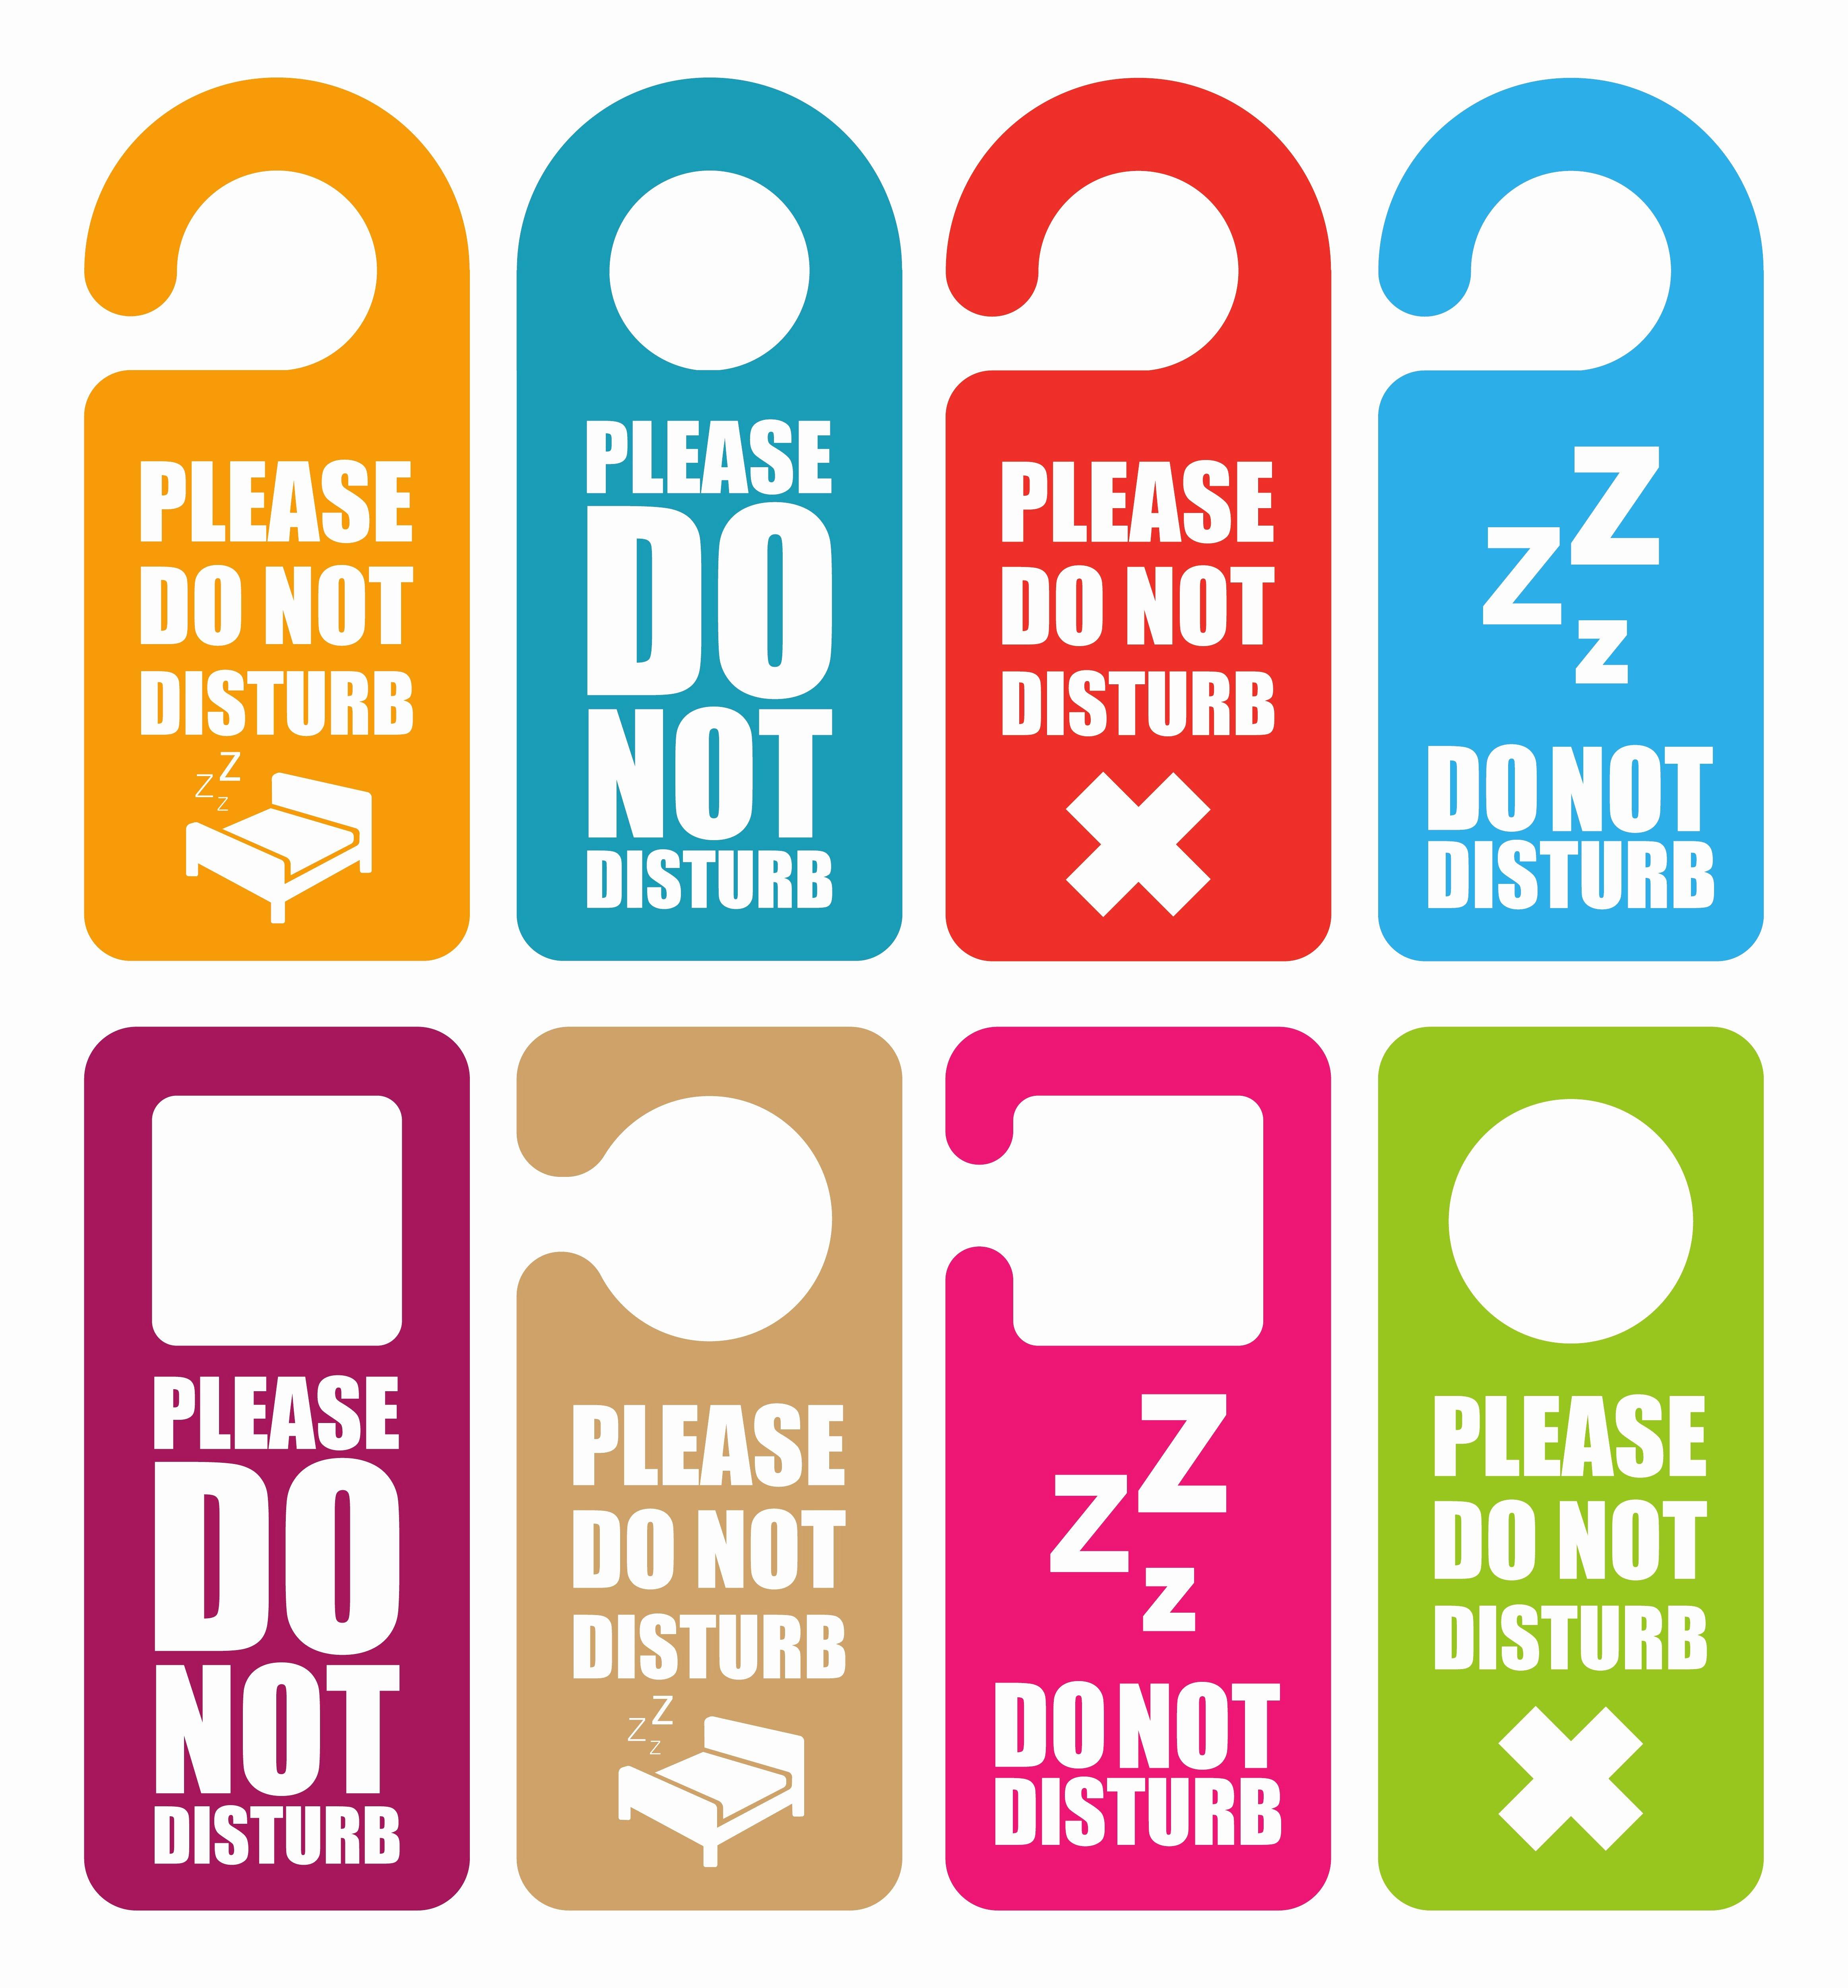 Do Not Disturb Sign Templates Inspirational Do Not Disturb Door Hanger Illustrations Creative Market